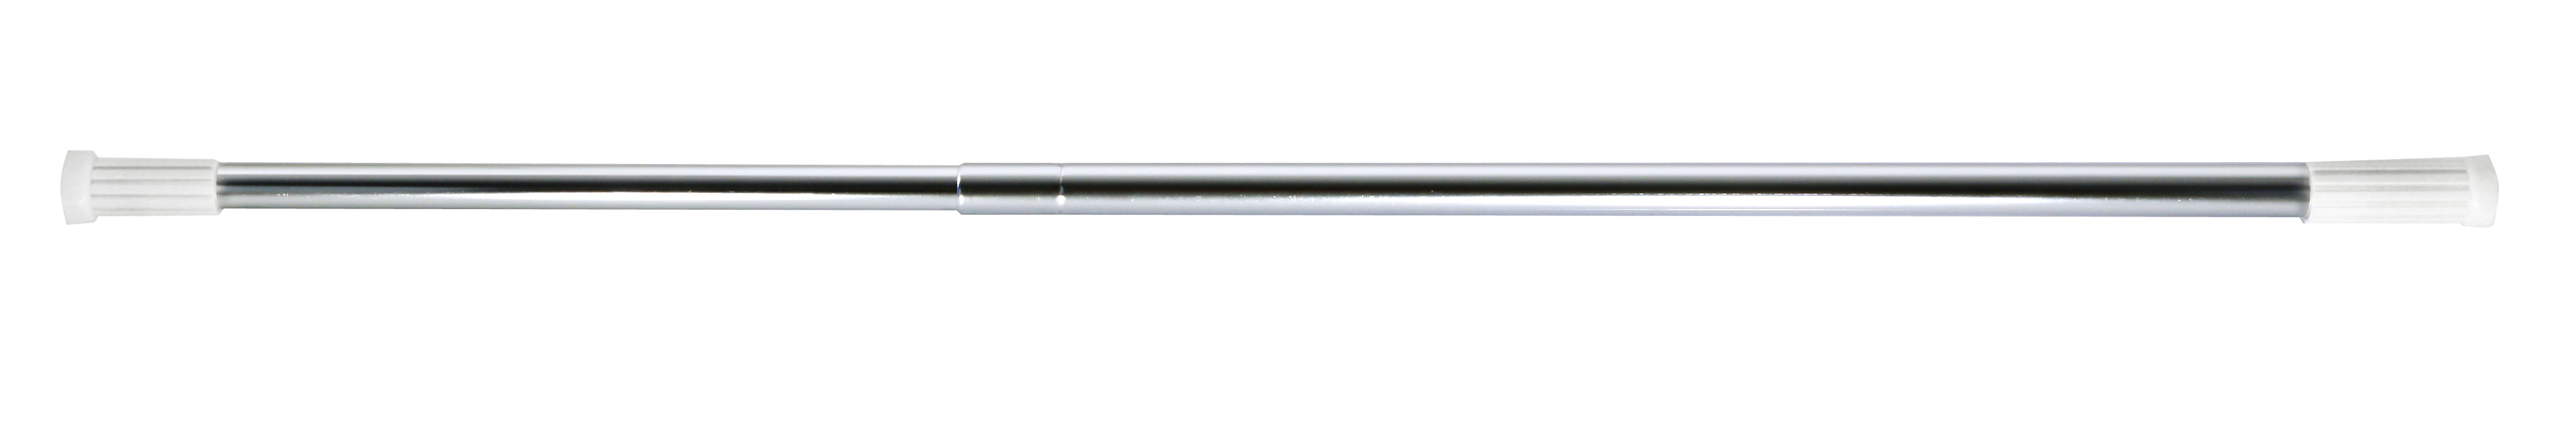 Tyč na sprchový závěs Olsen 70-120 chrom, skladem